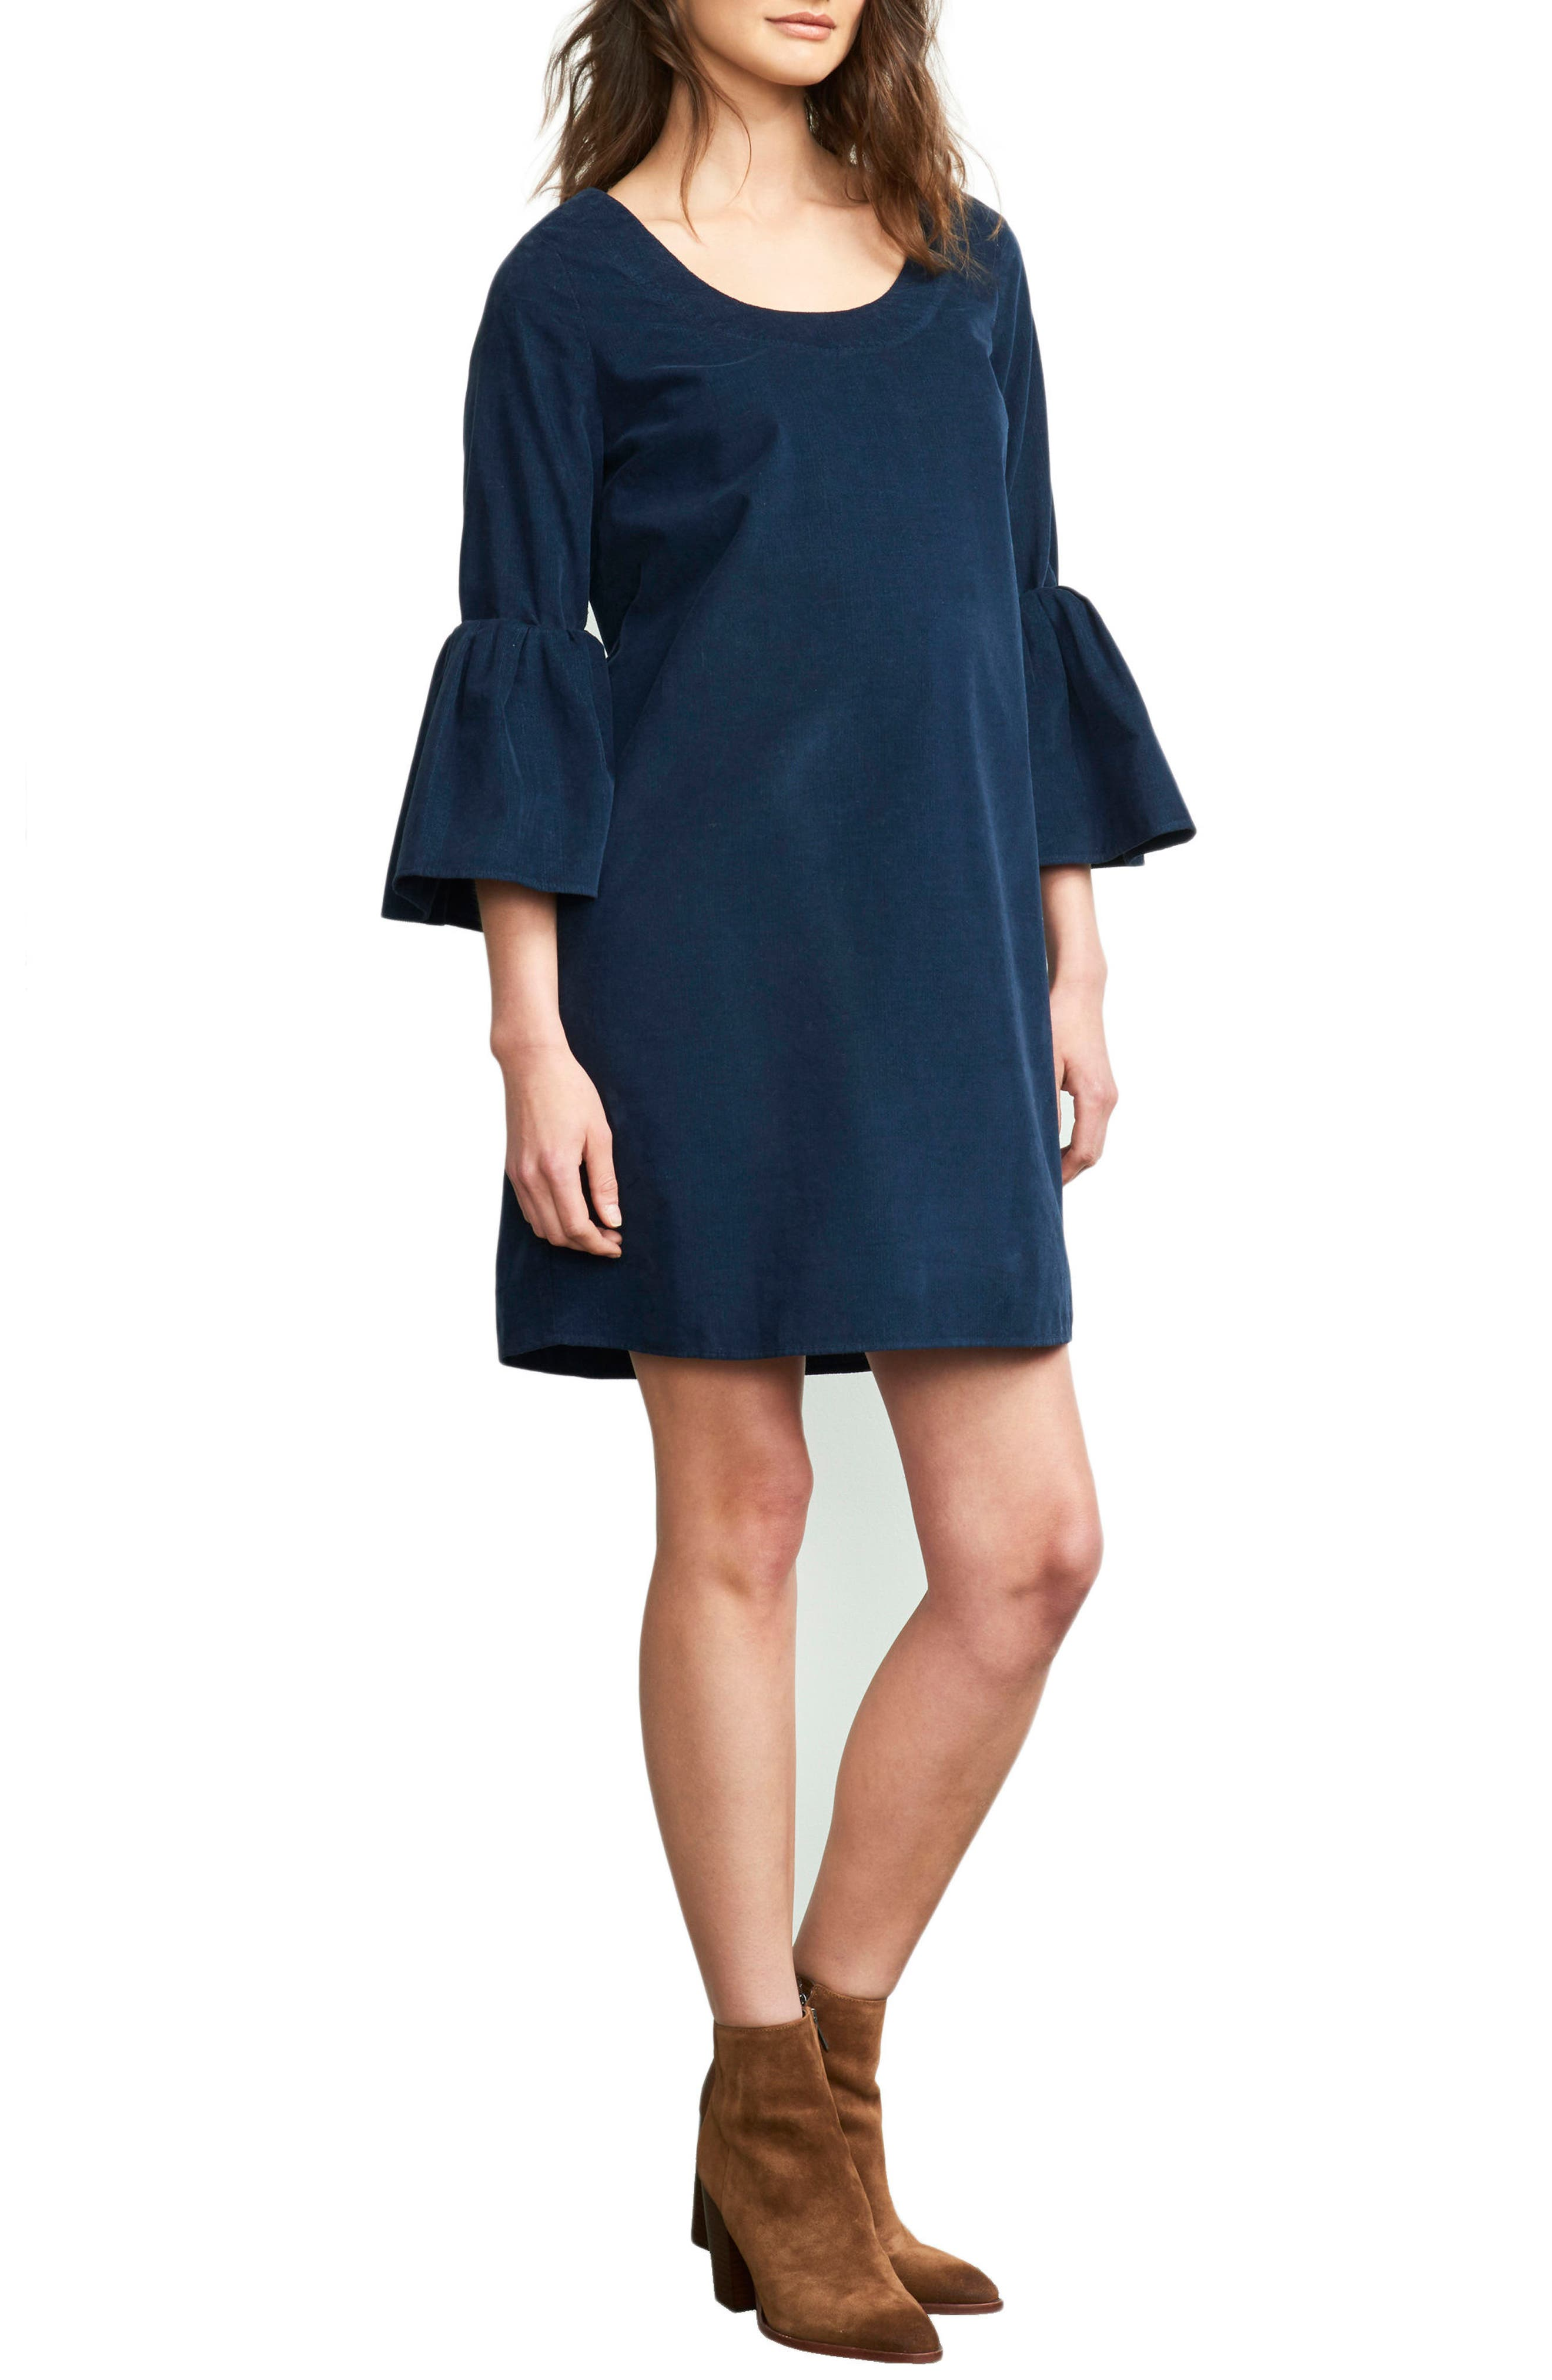 Maternal America Bell Sleeve Maternity Dress, Blue